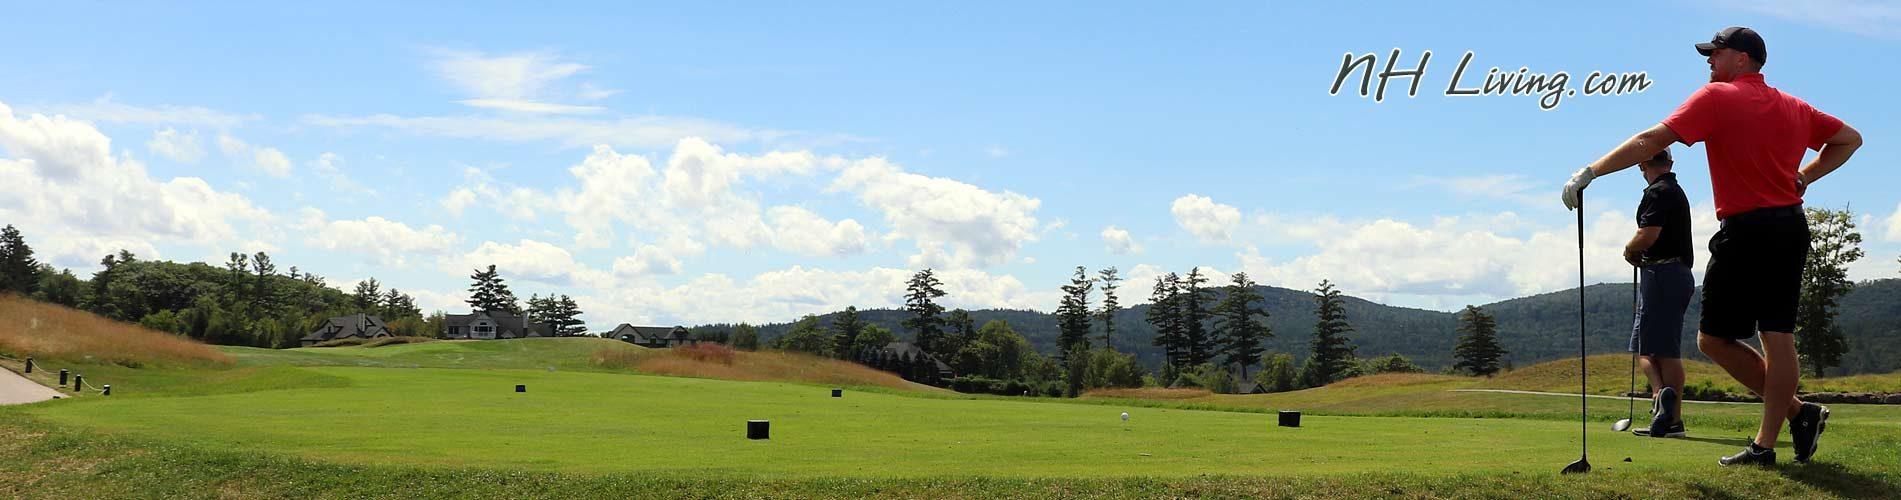 NH Golf Vacations, White Mountain NH Resorts